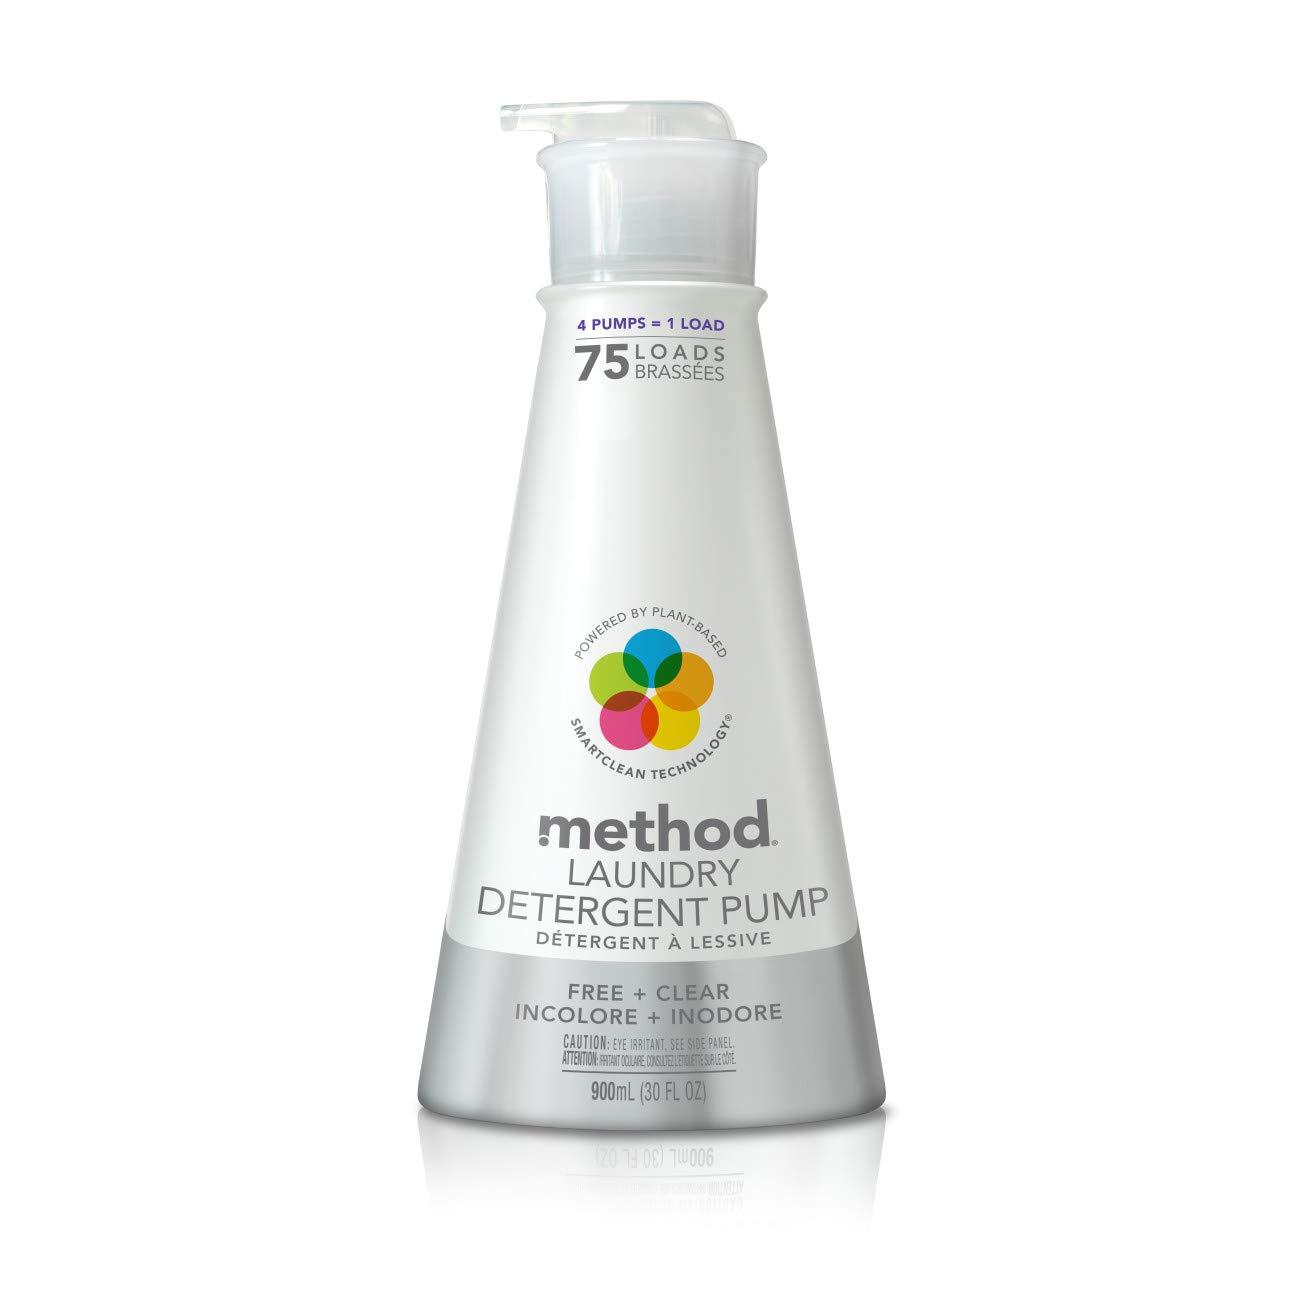 Method Laundry Detergent Pump, Free + Clear, 30 Fl Oz, 75 Loads